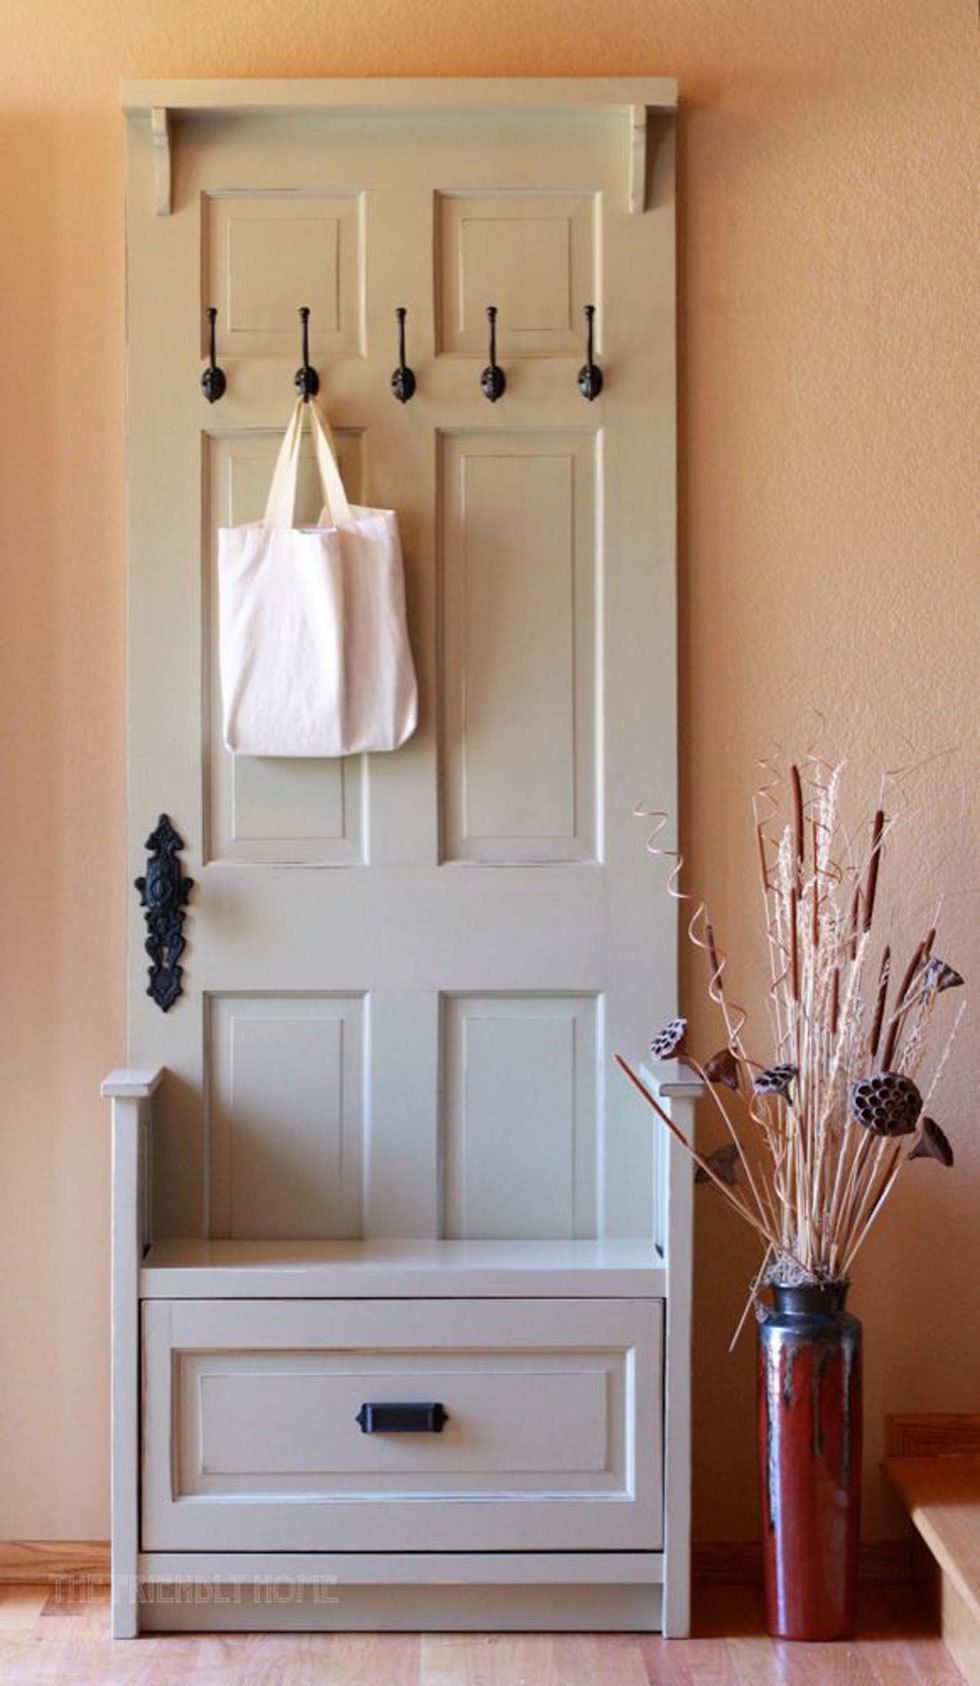 10 Ways to Reuse Old Doors in Your Home -